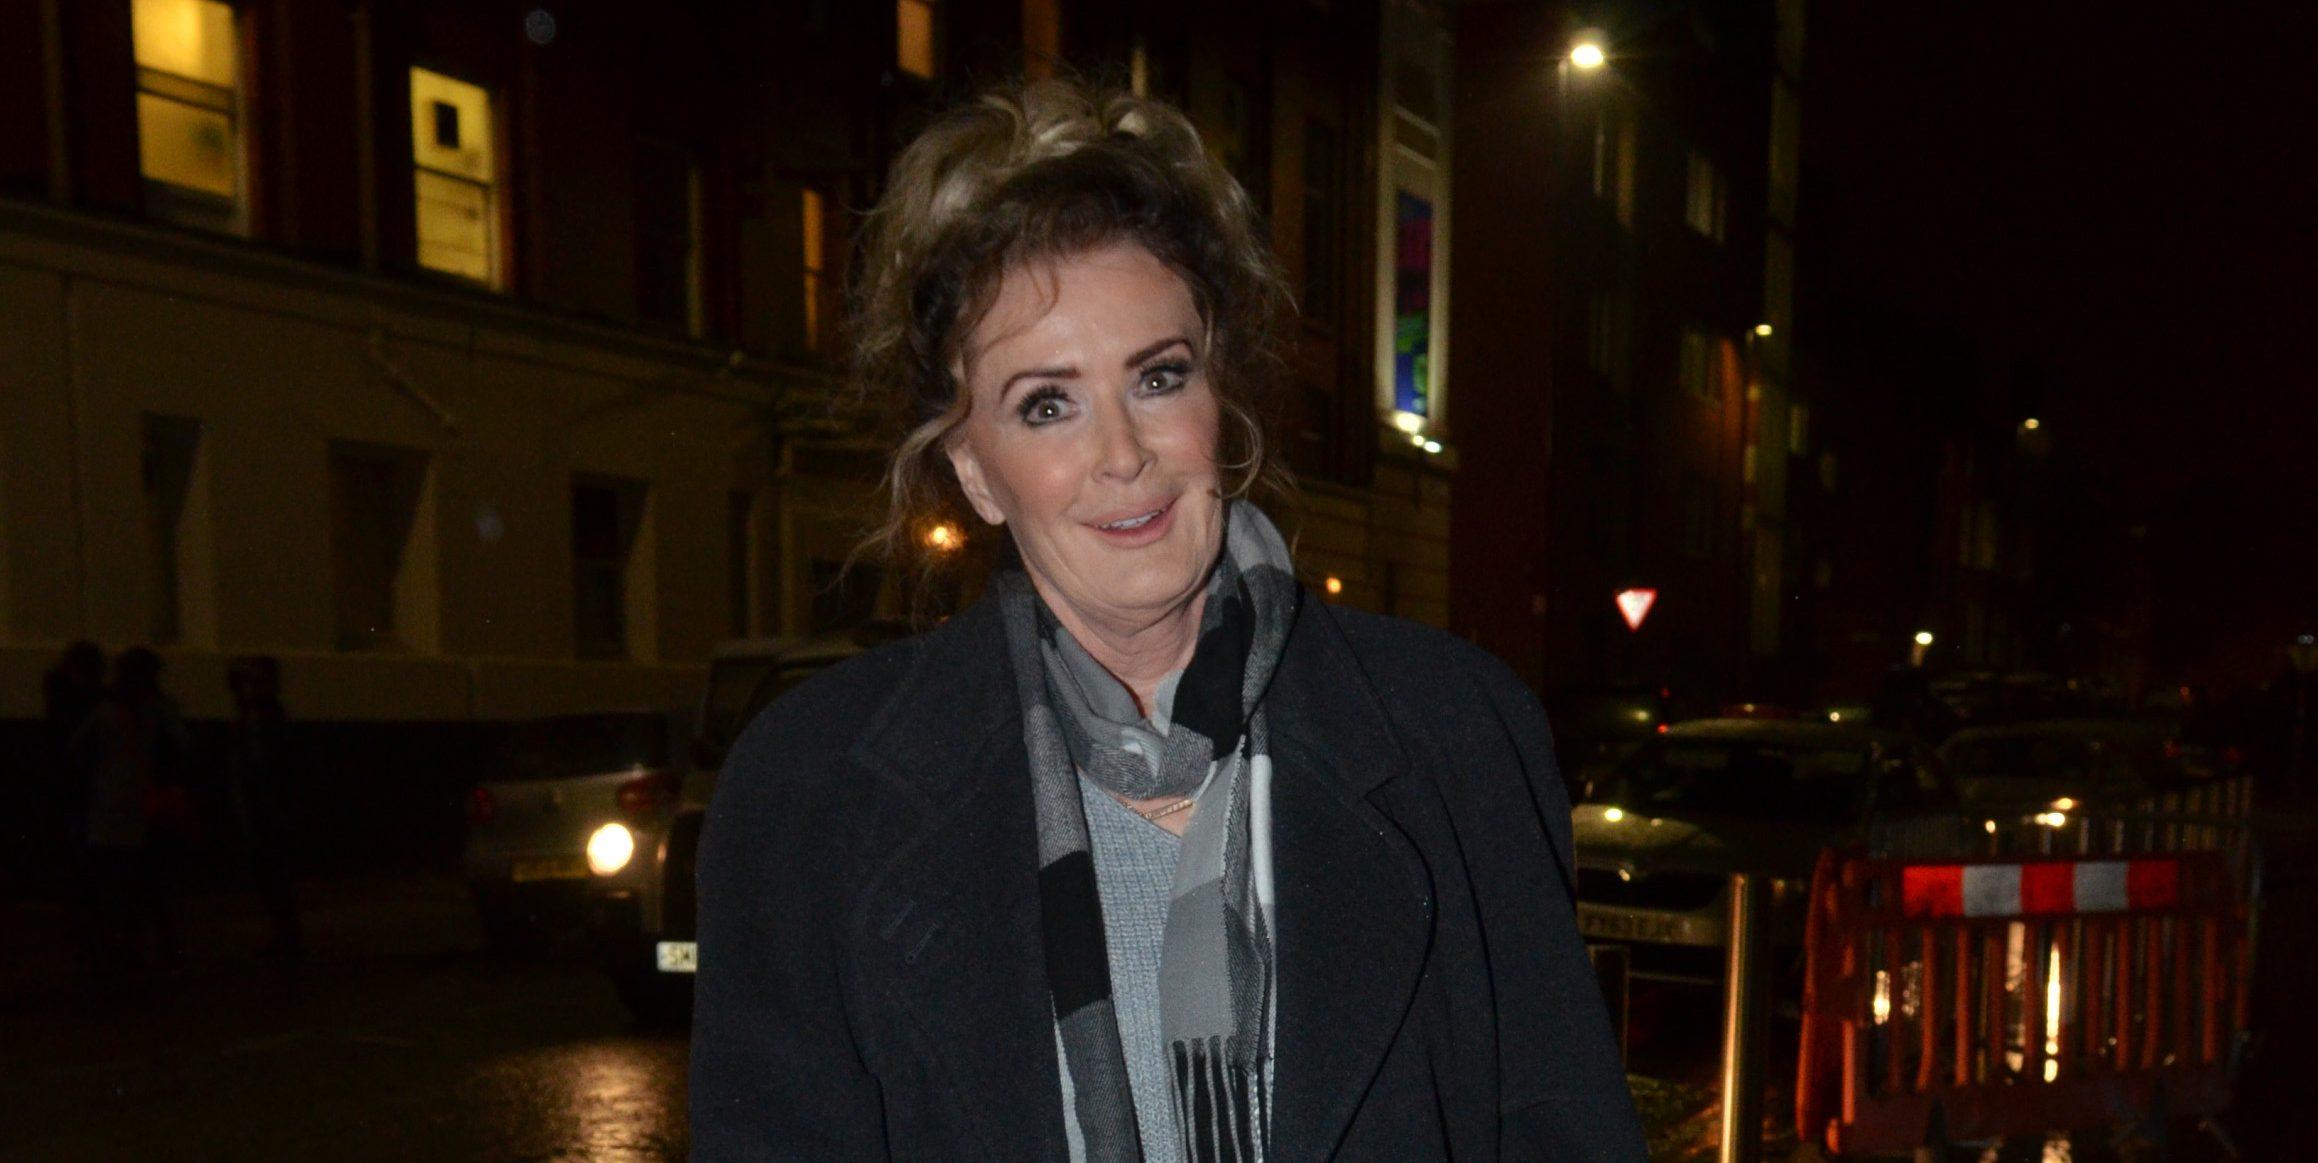 Coronation Street's Beverley Callard enjoys trip to New York with daughter Rebecca